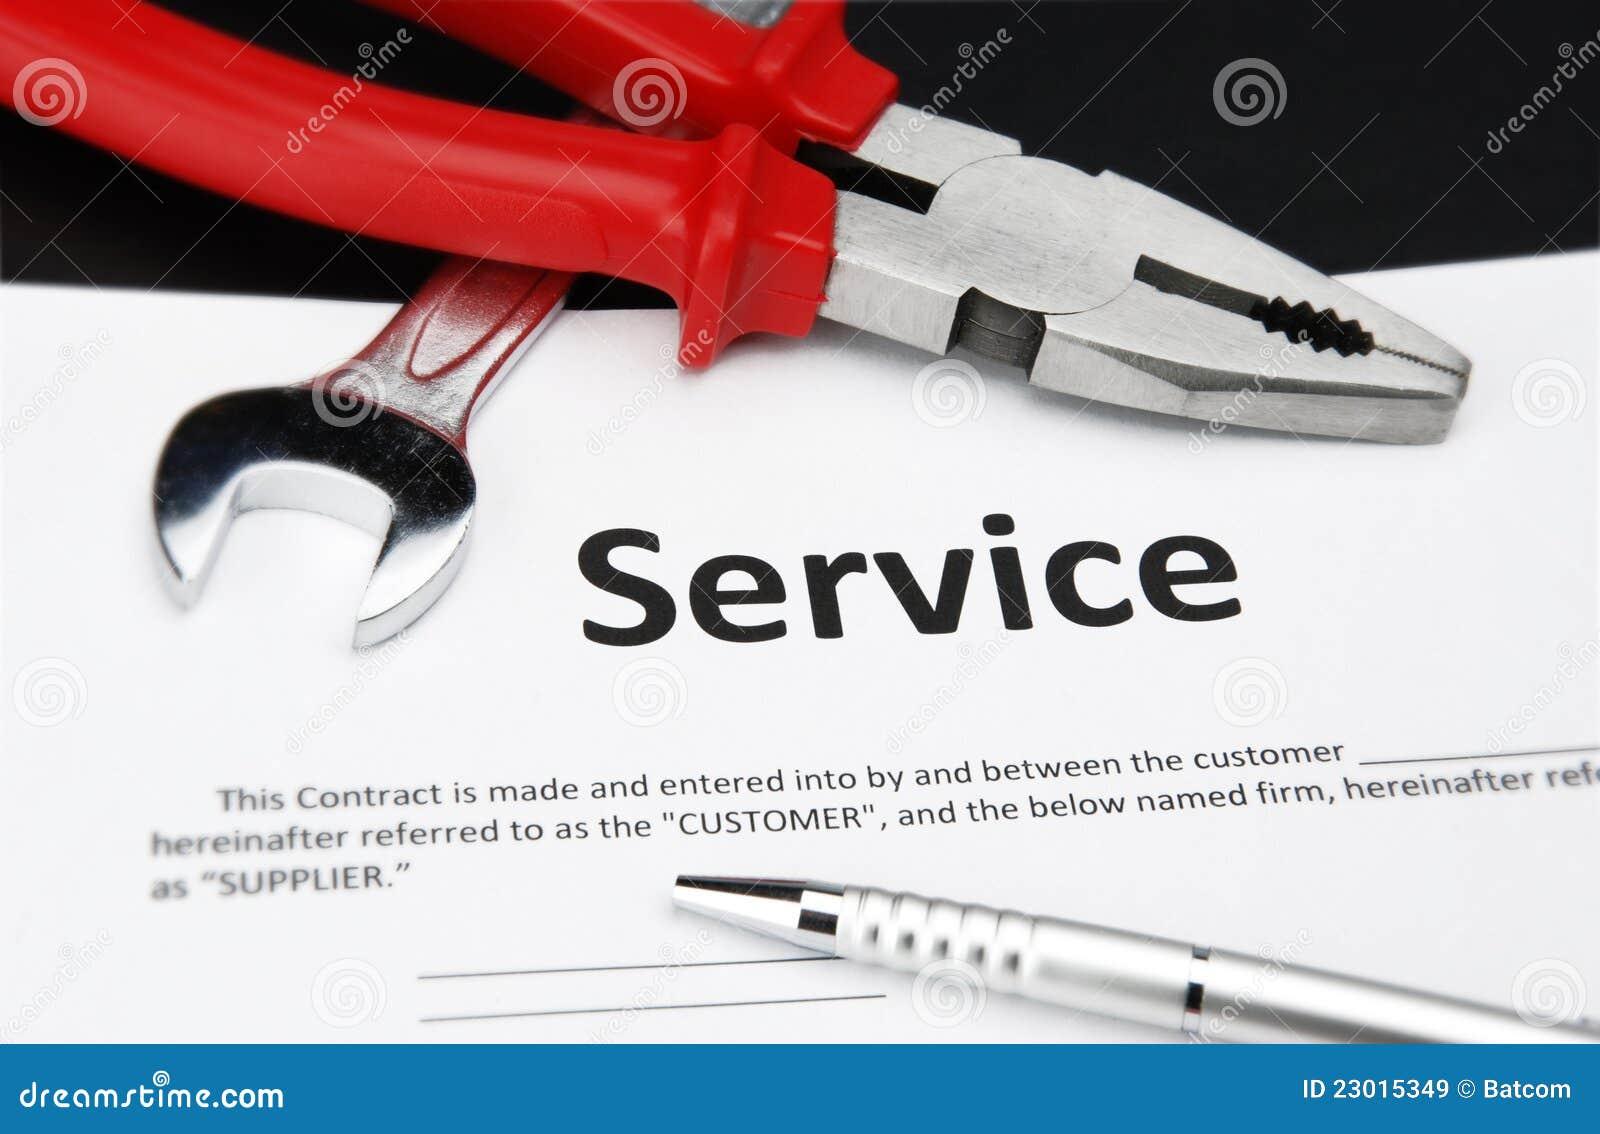 contrat d 39 entretien image stock image du service signature 23015349. Black Bedroom Furniture Sets. Home Design Ideas